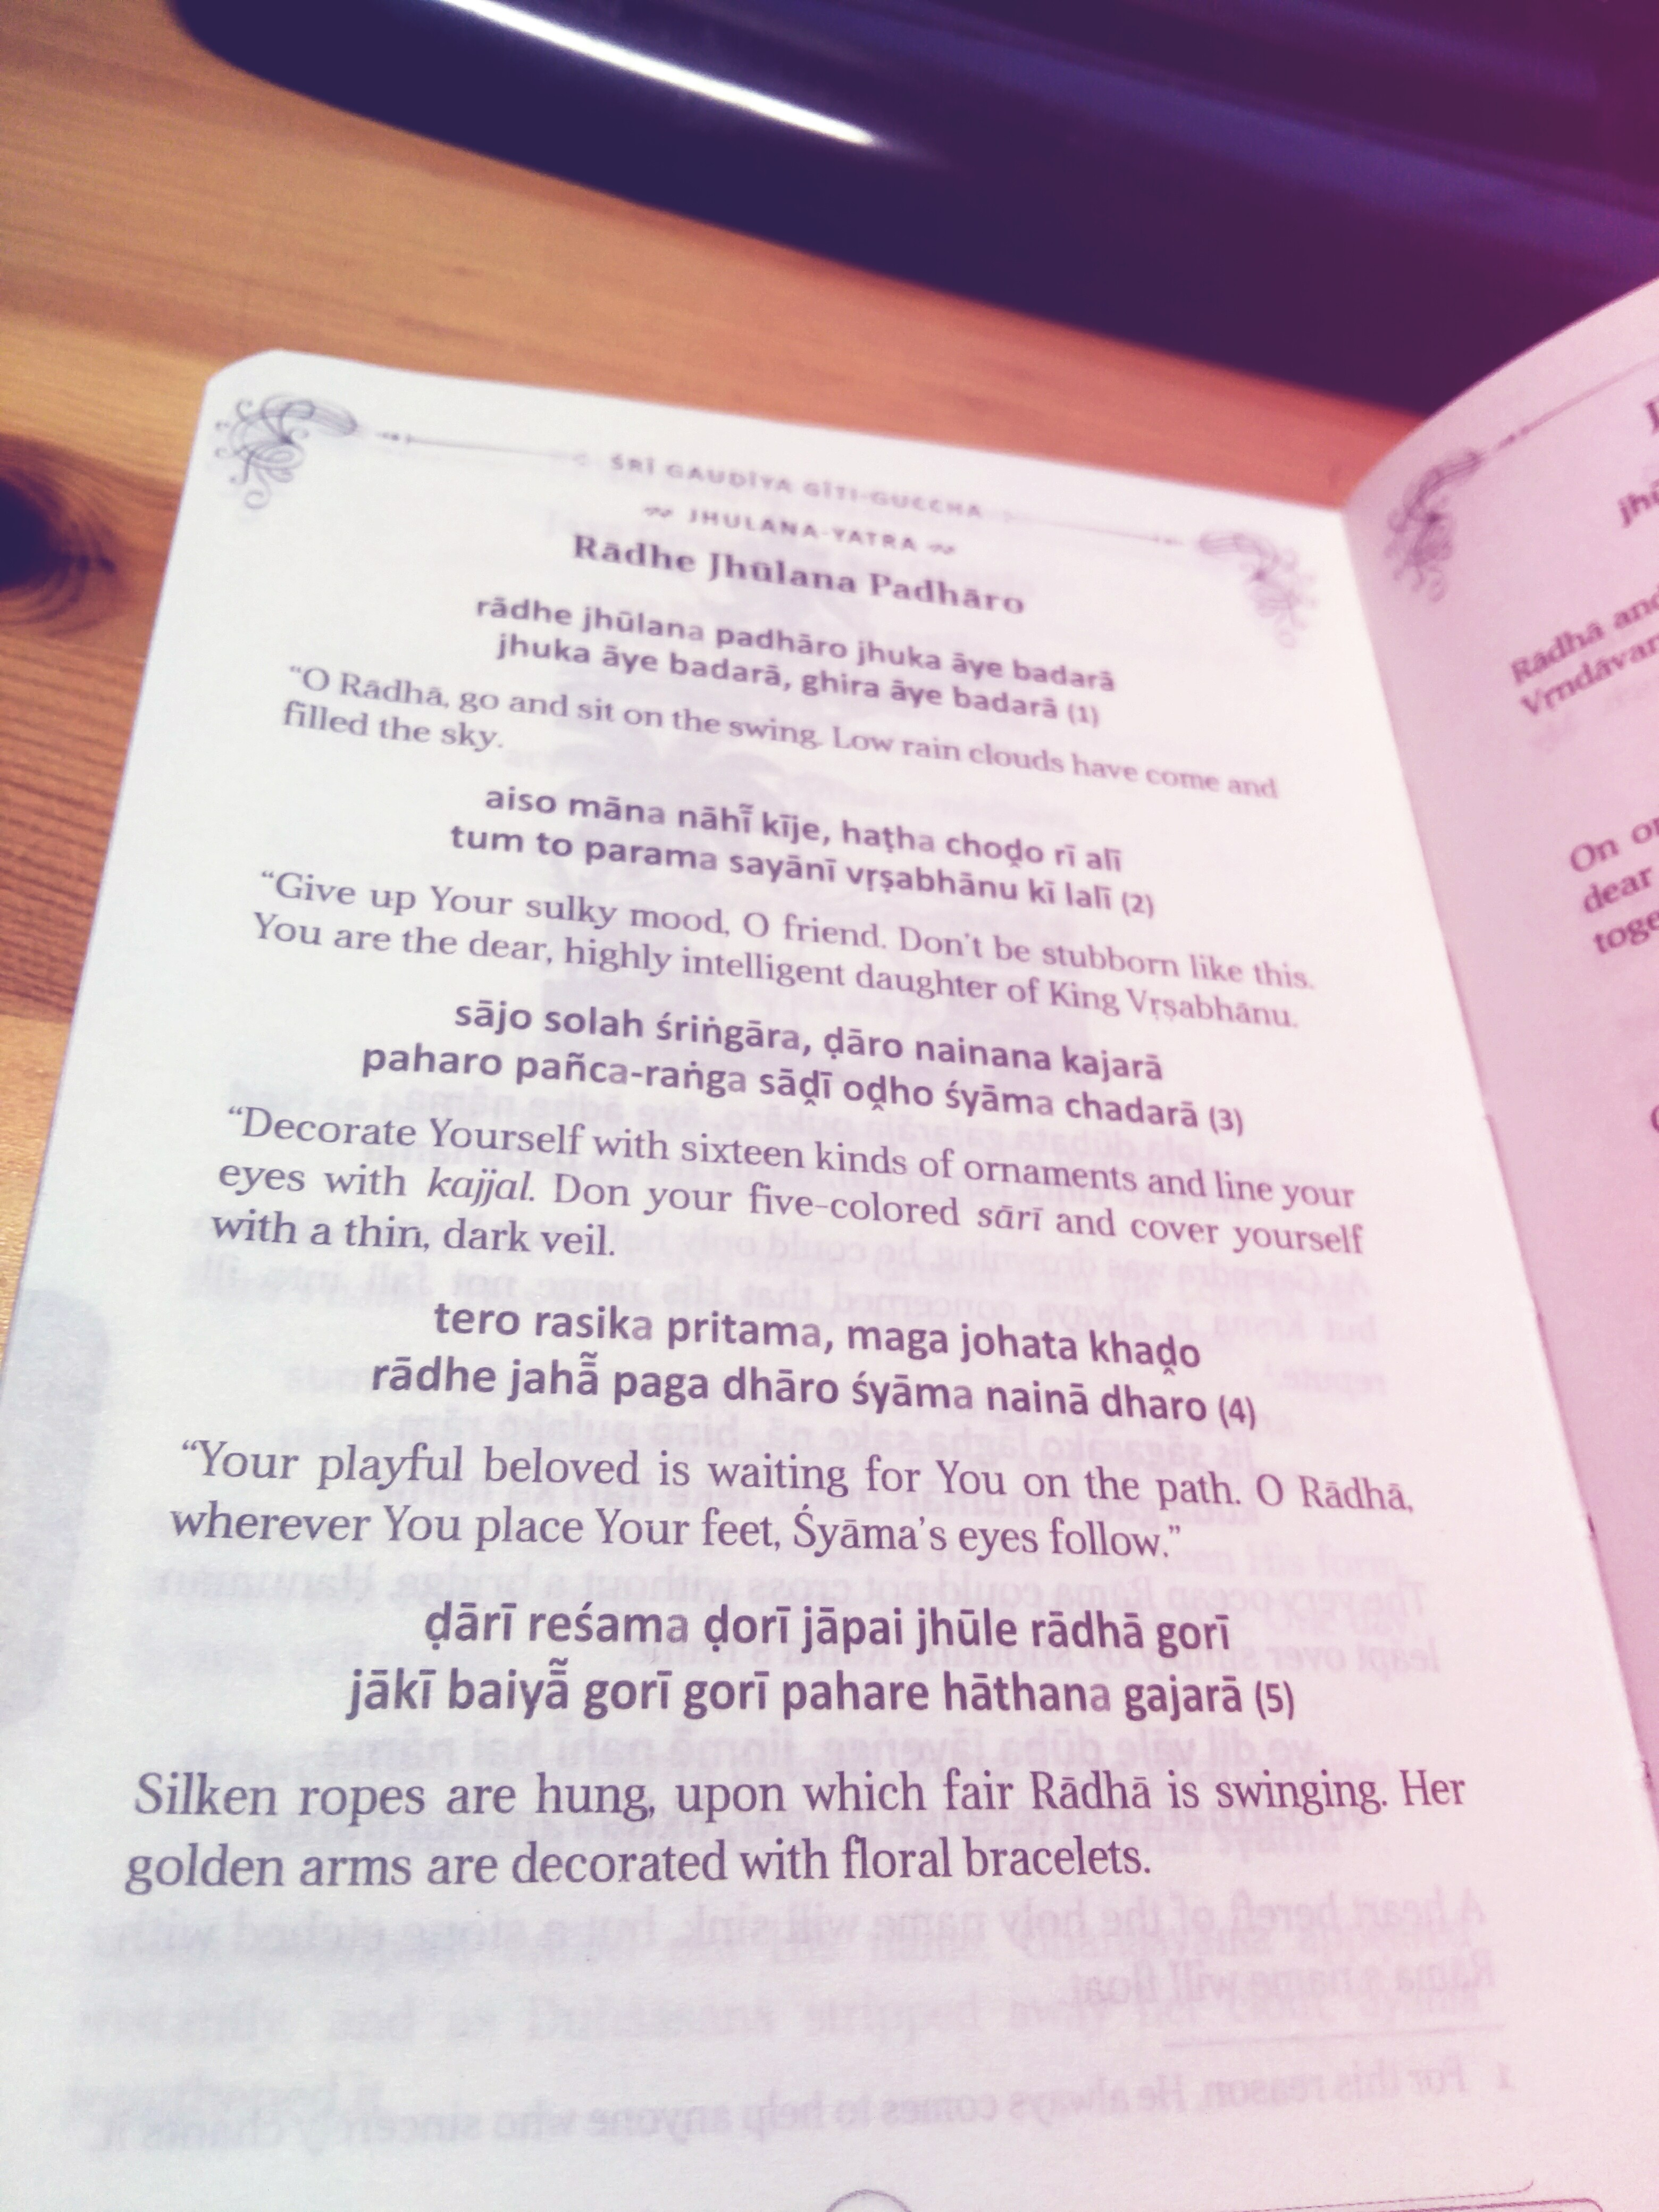 Radhe Jhulana Padharro lyrics